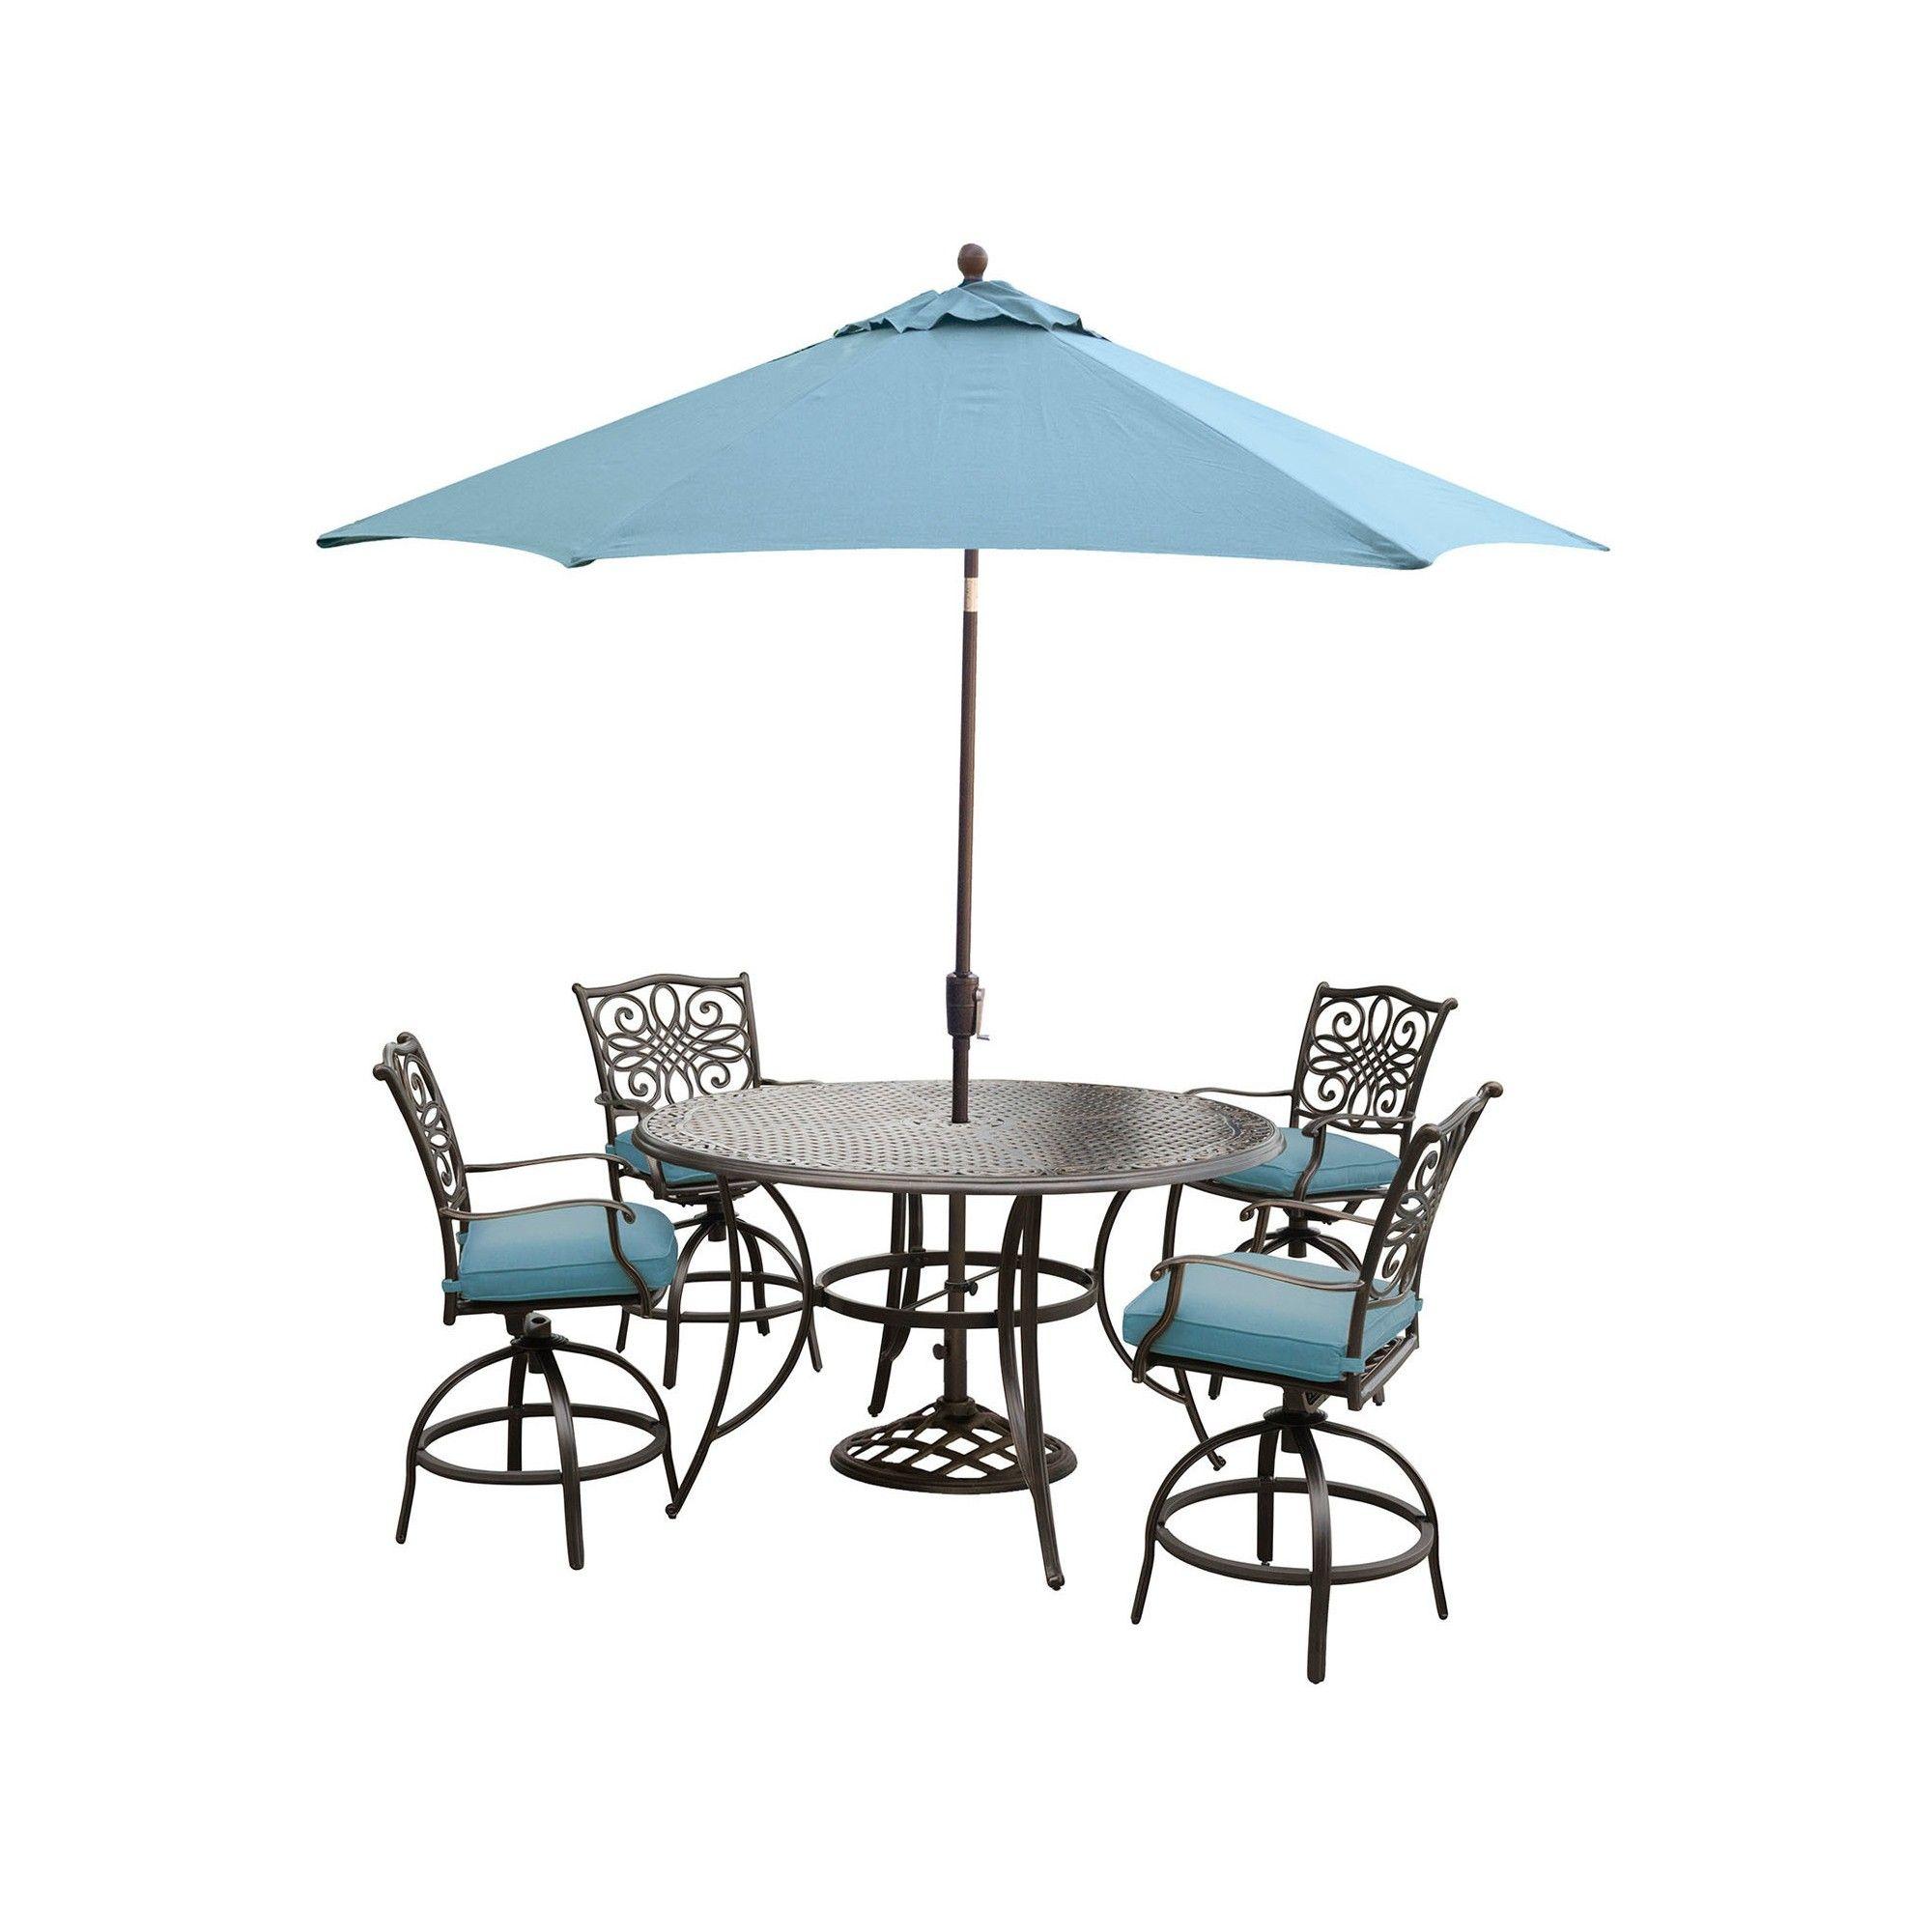 lane multiple dining with ip piece com mainstays set umbrella furniture folding albany colors walmart patio